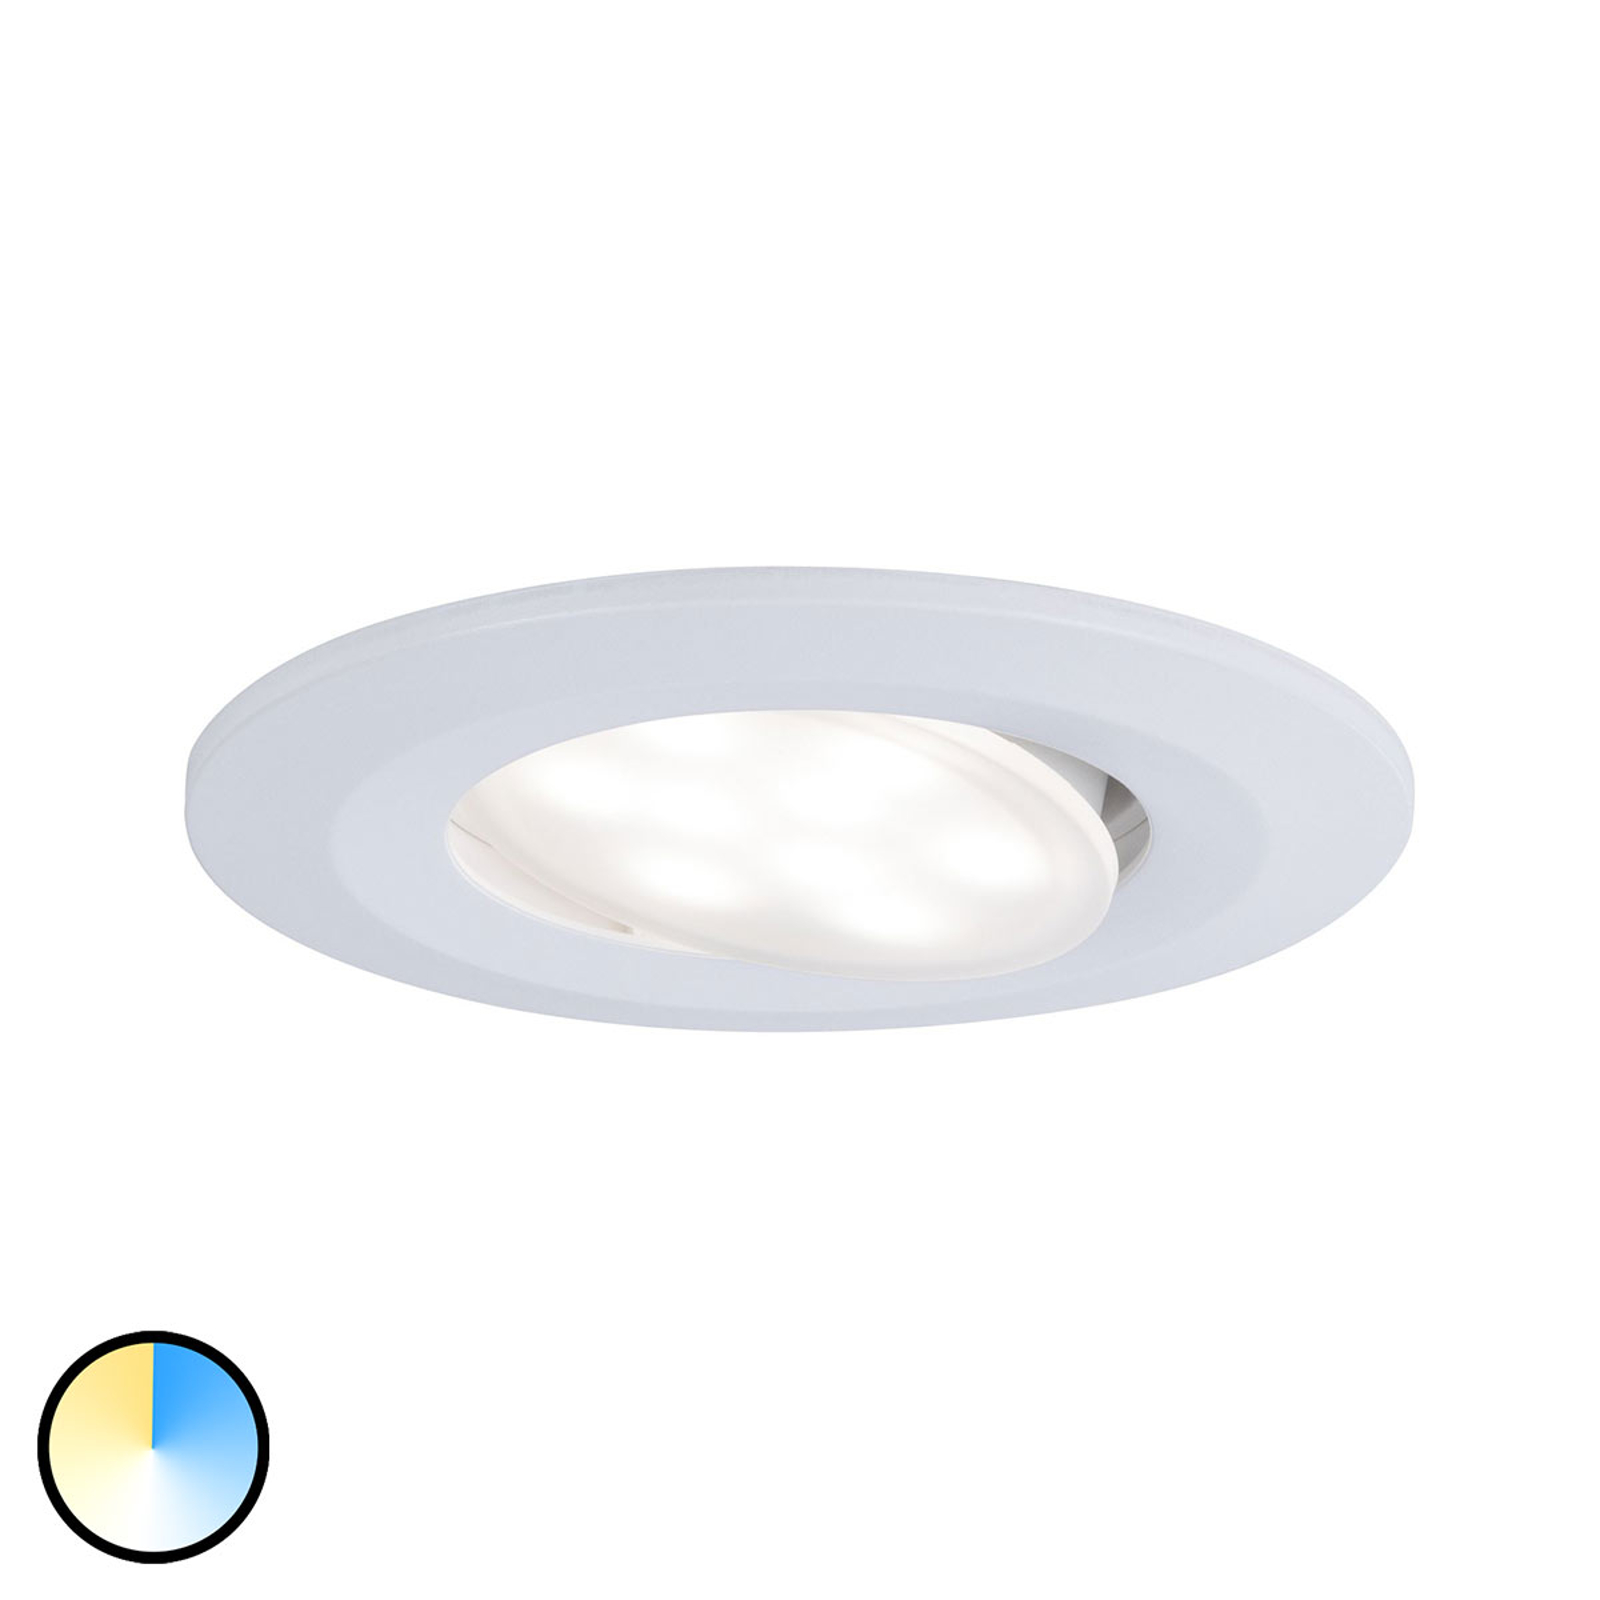 Paulmann LED inbouwspot Calla wit kleurverandering